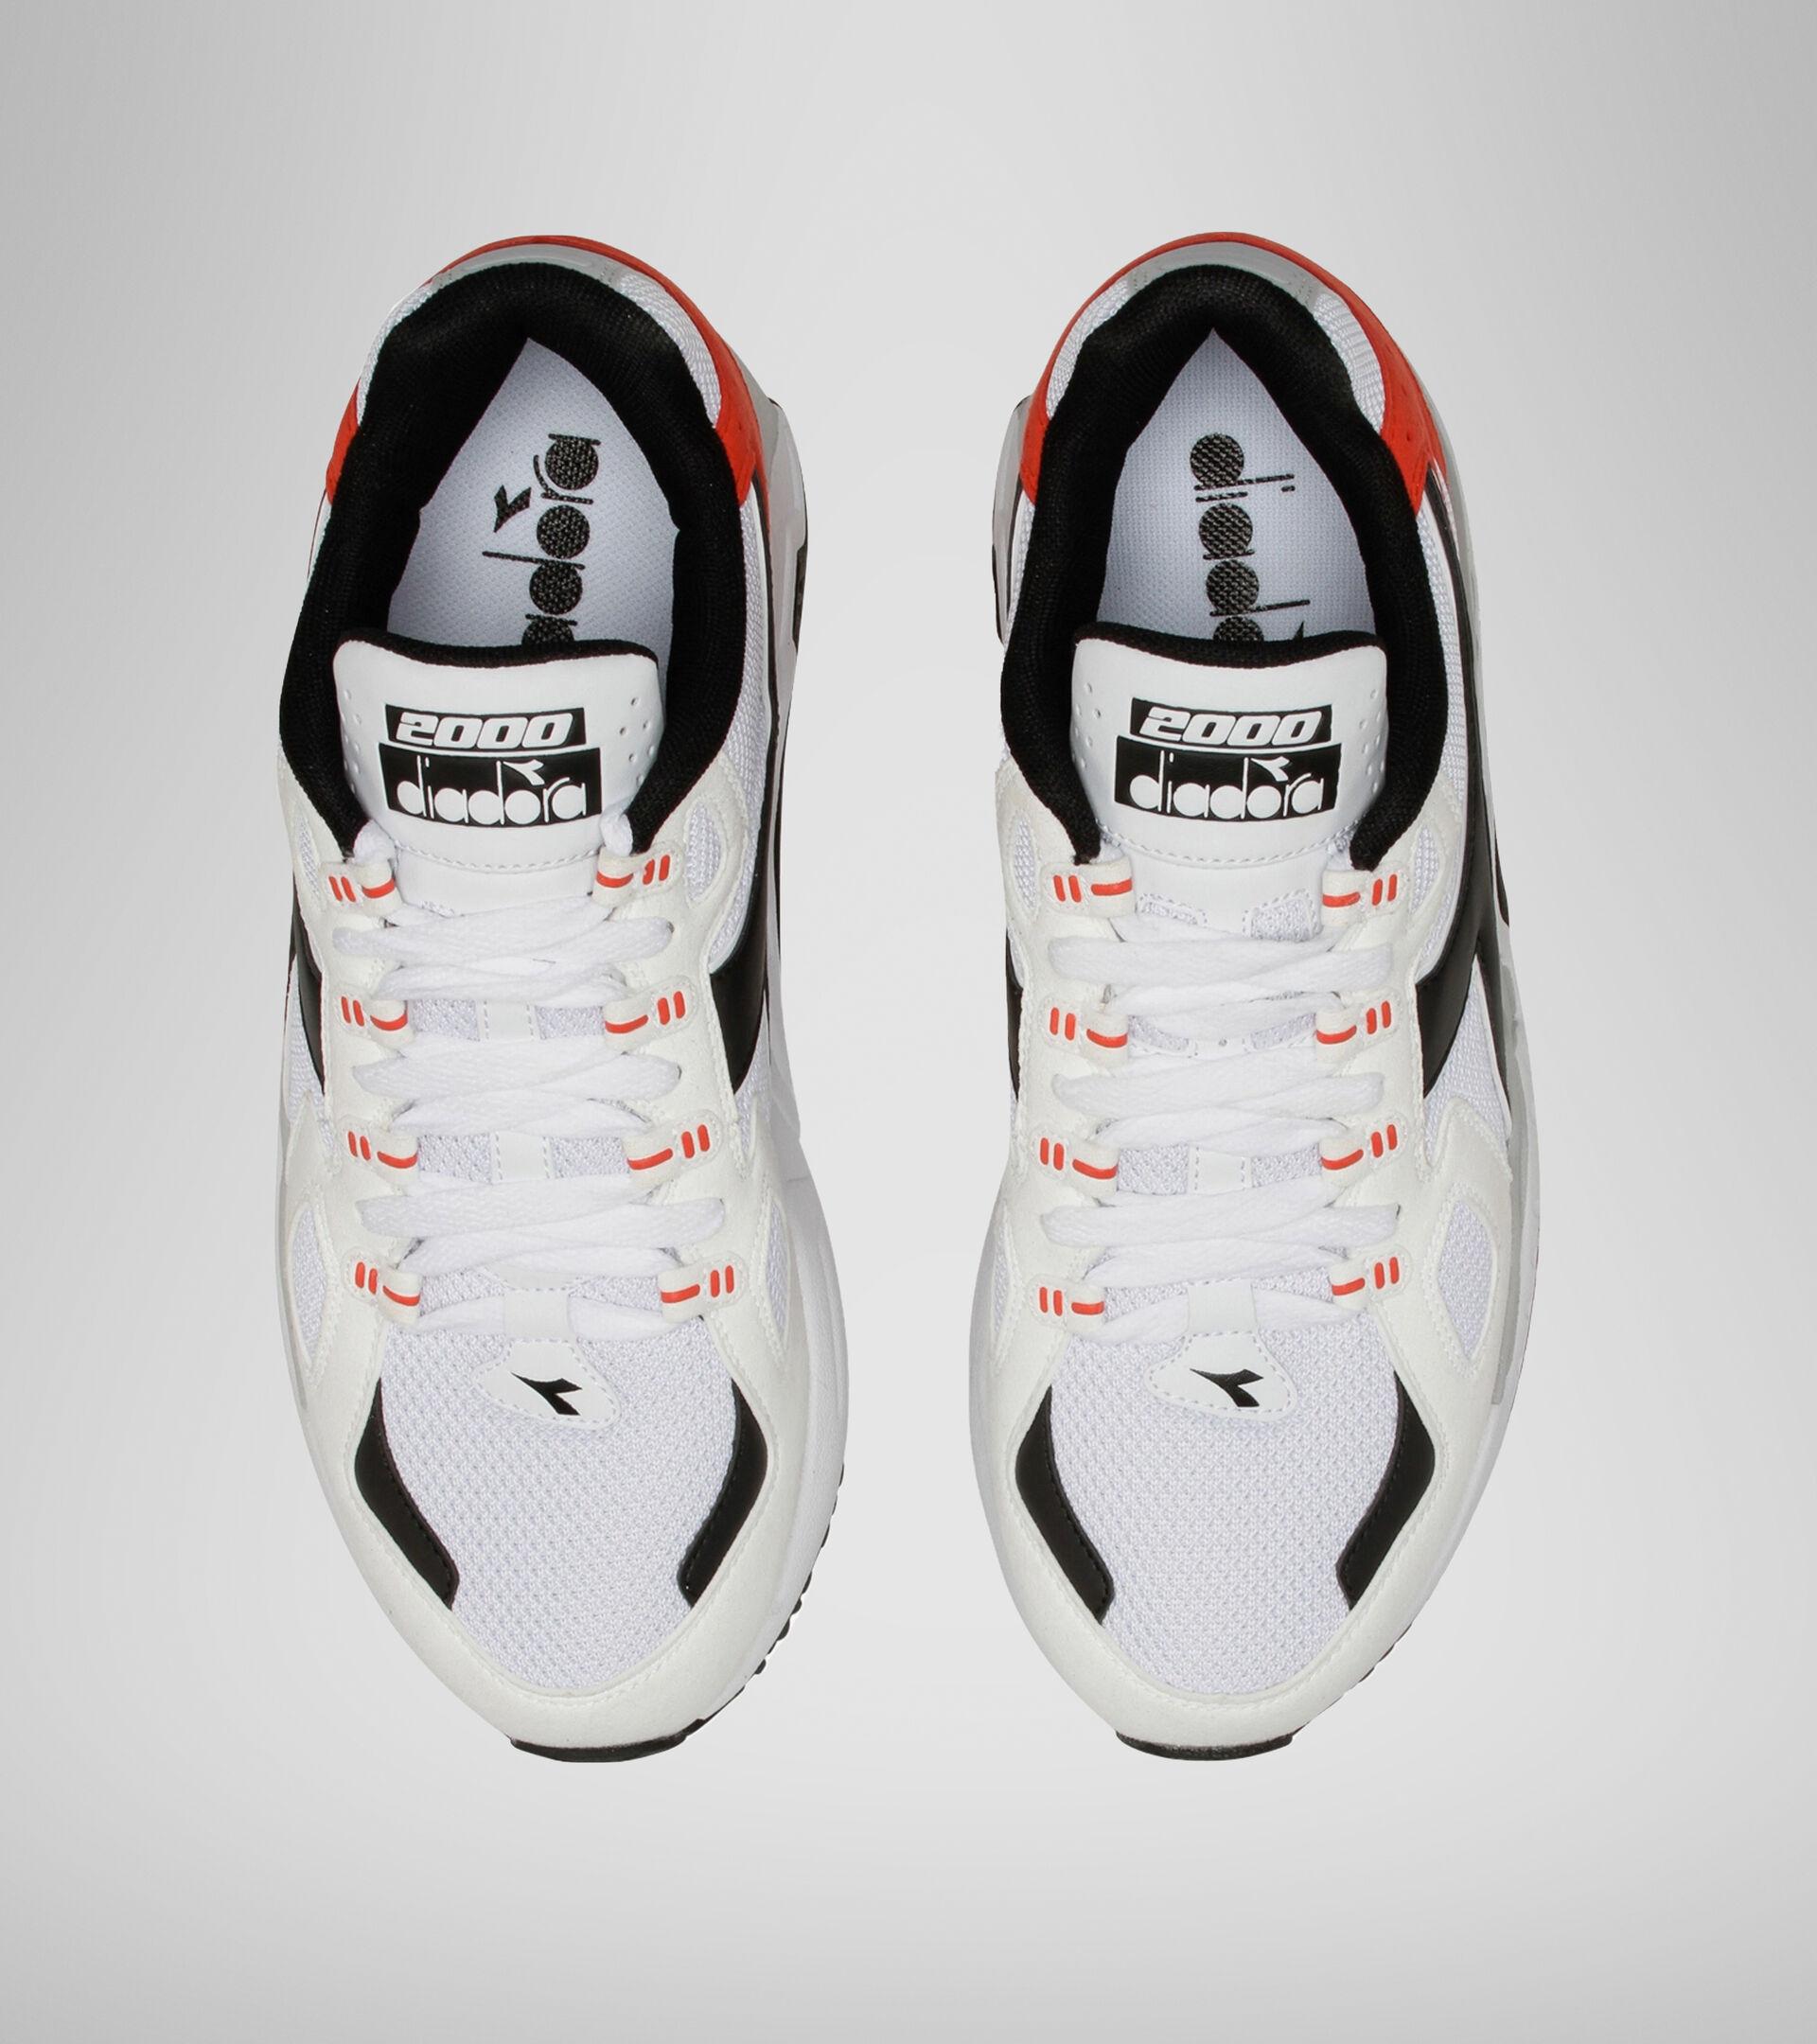 Footwear Sportswear UOMO MYTHOS SUEDE BIANCO/NERO/ROSSO FIESTA Diadora